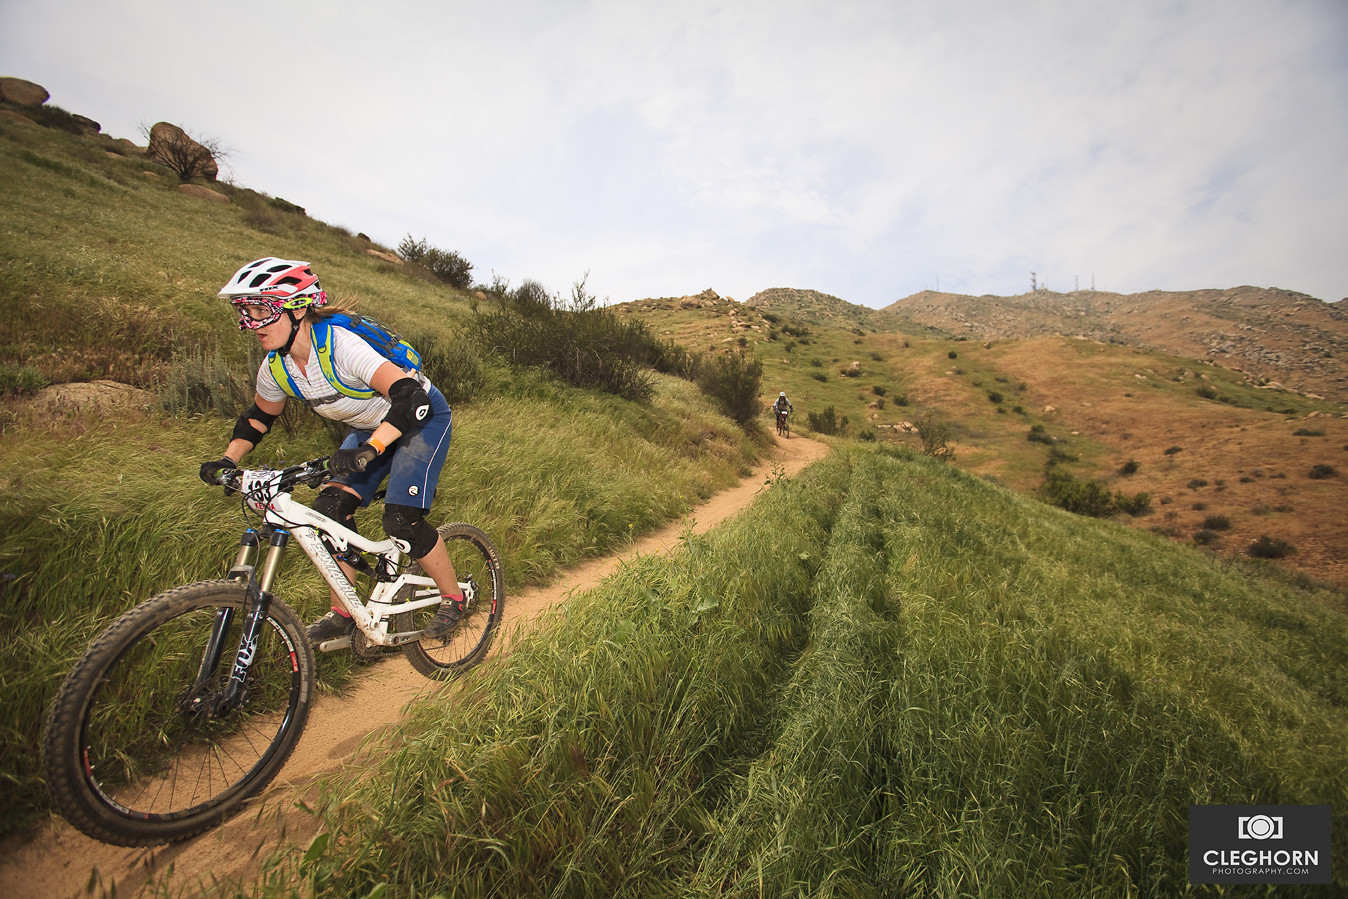 Sweet! - Cleghorn Photography - Mountain Biking Pictures - Vital MTB